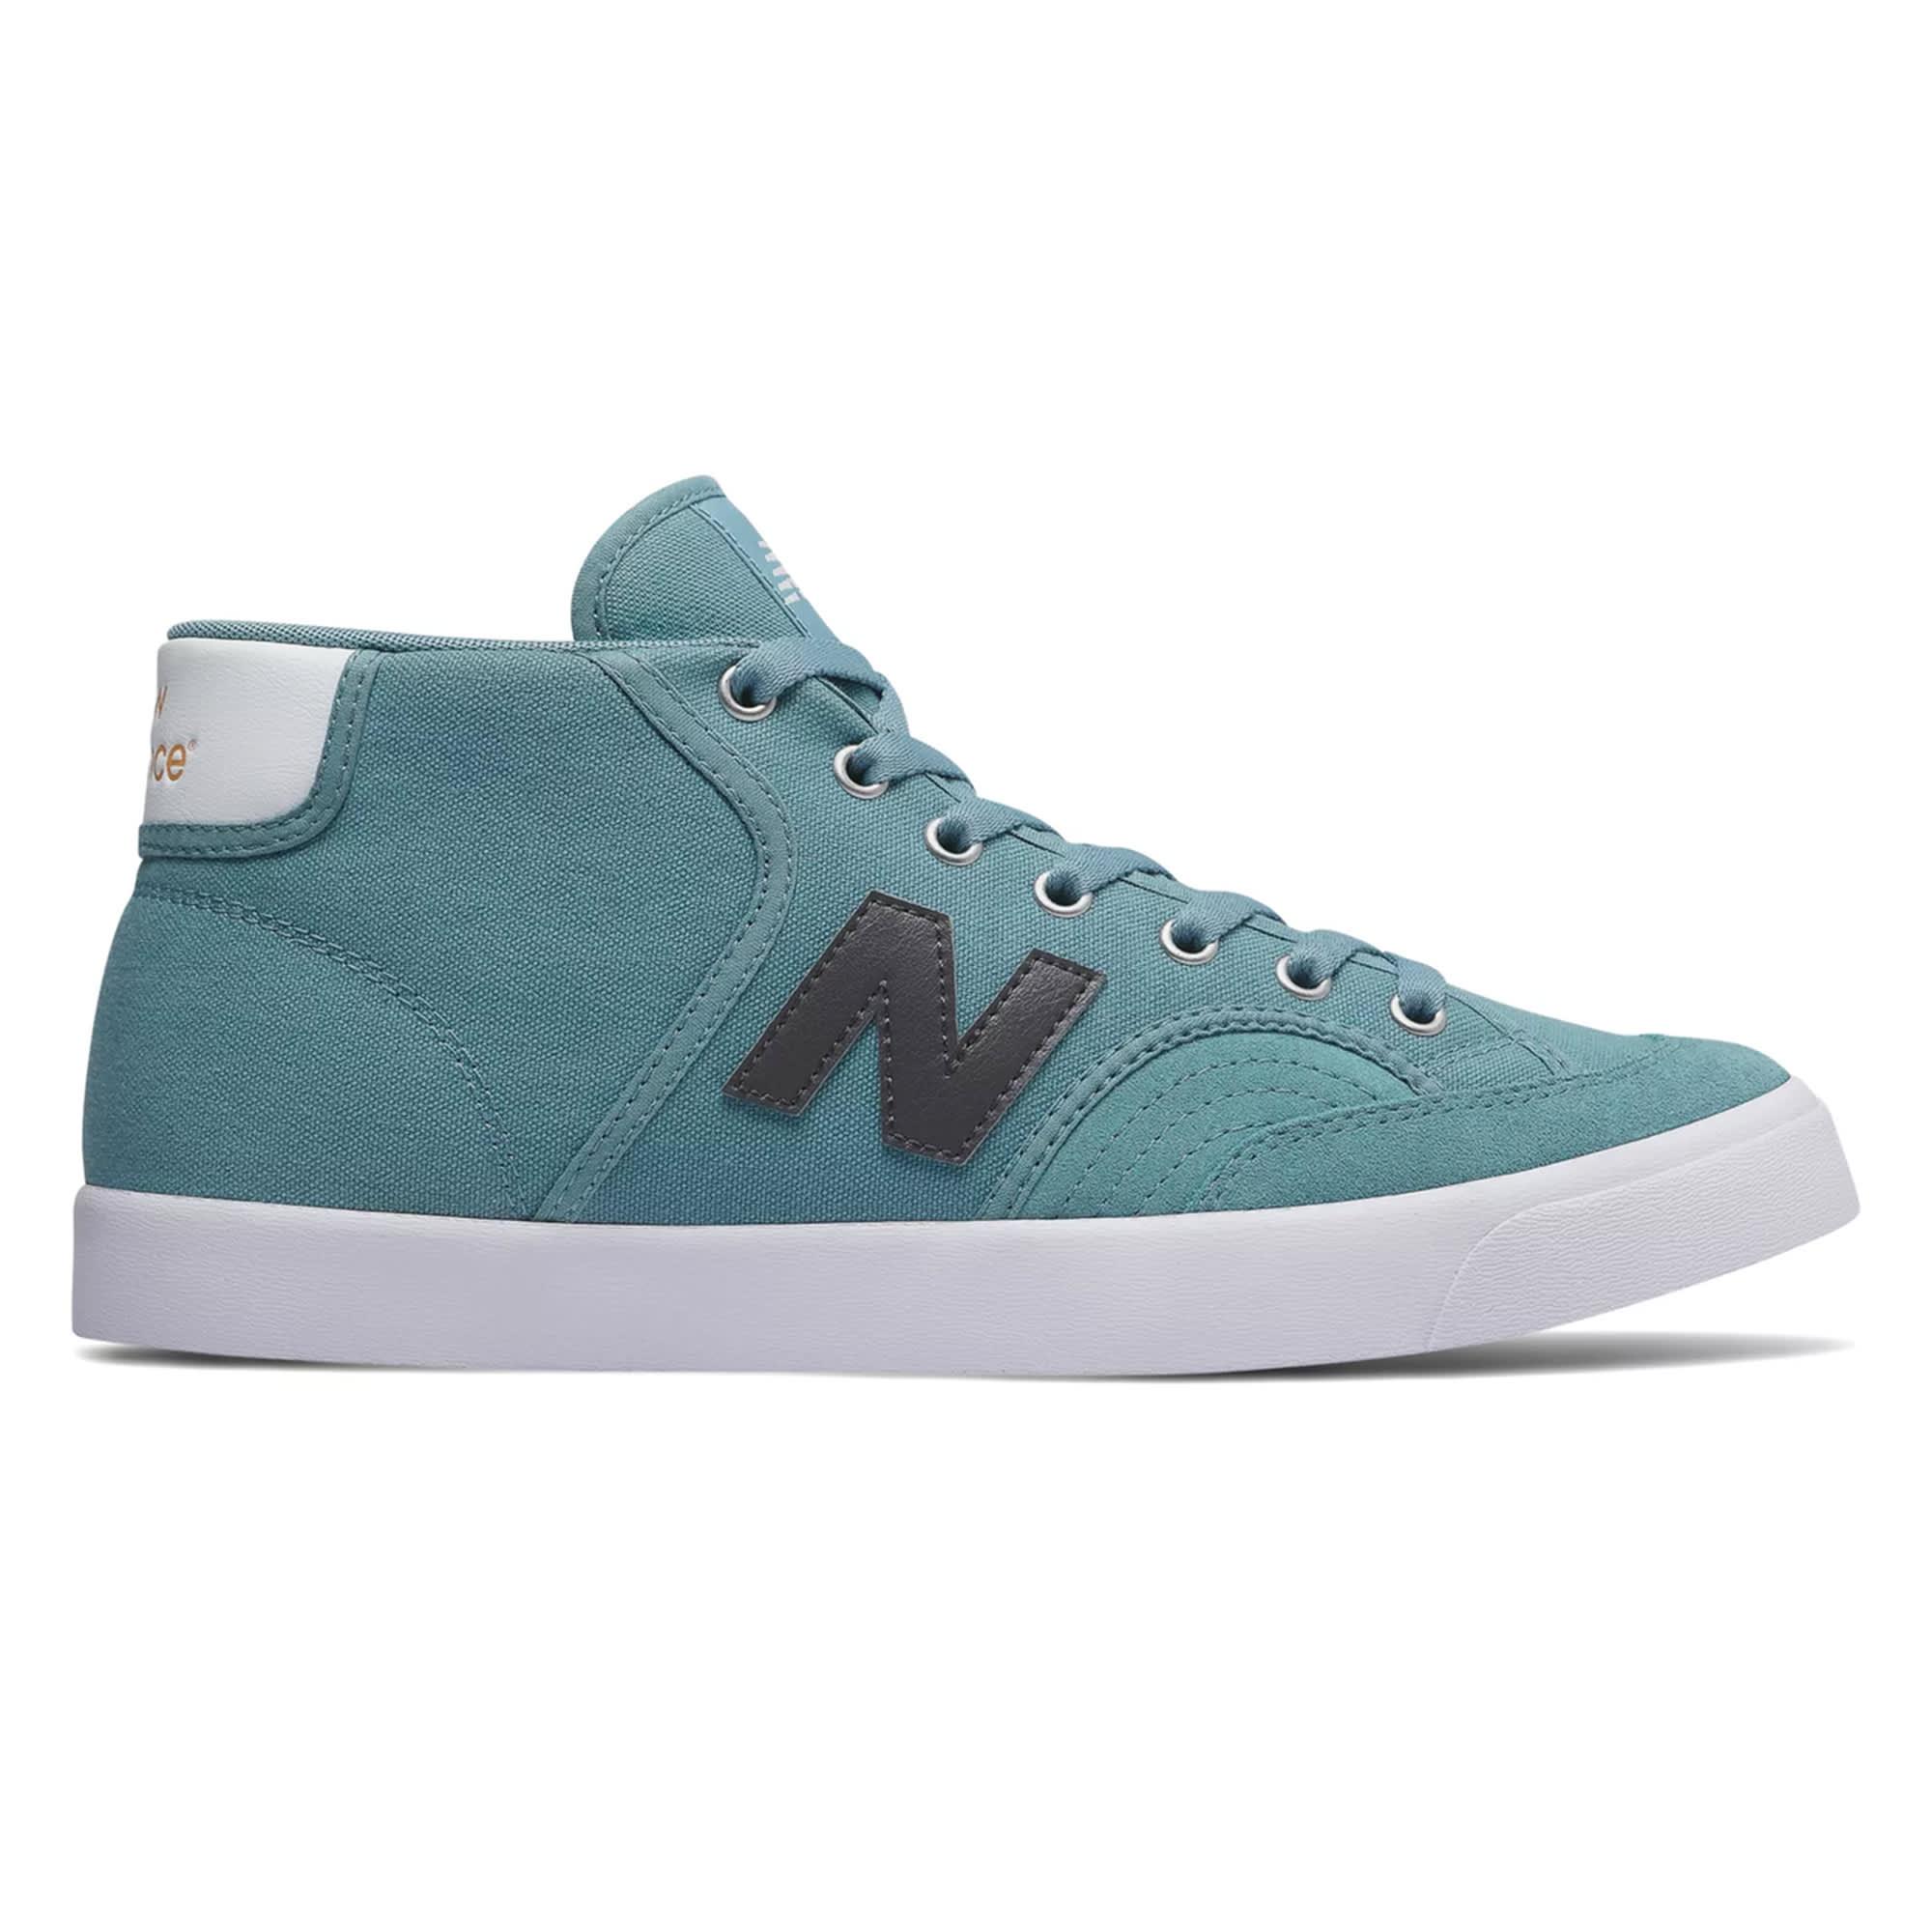 Balance Numeric Pro Court 213 Skate Shoes